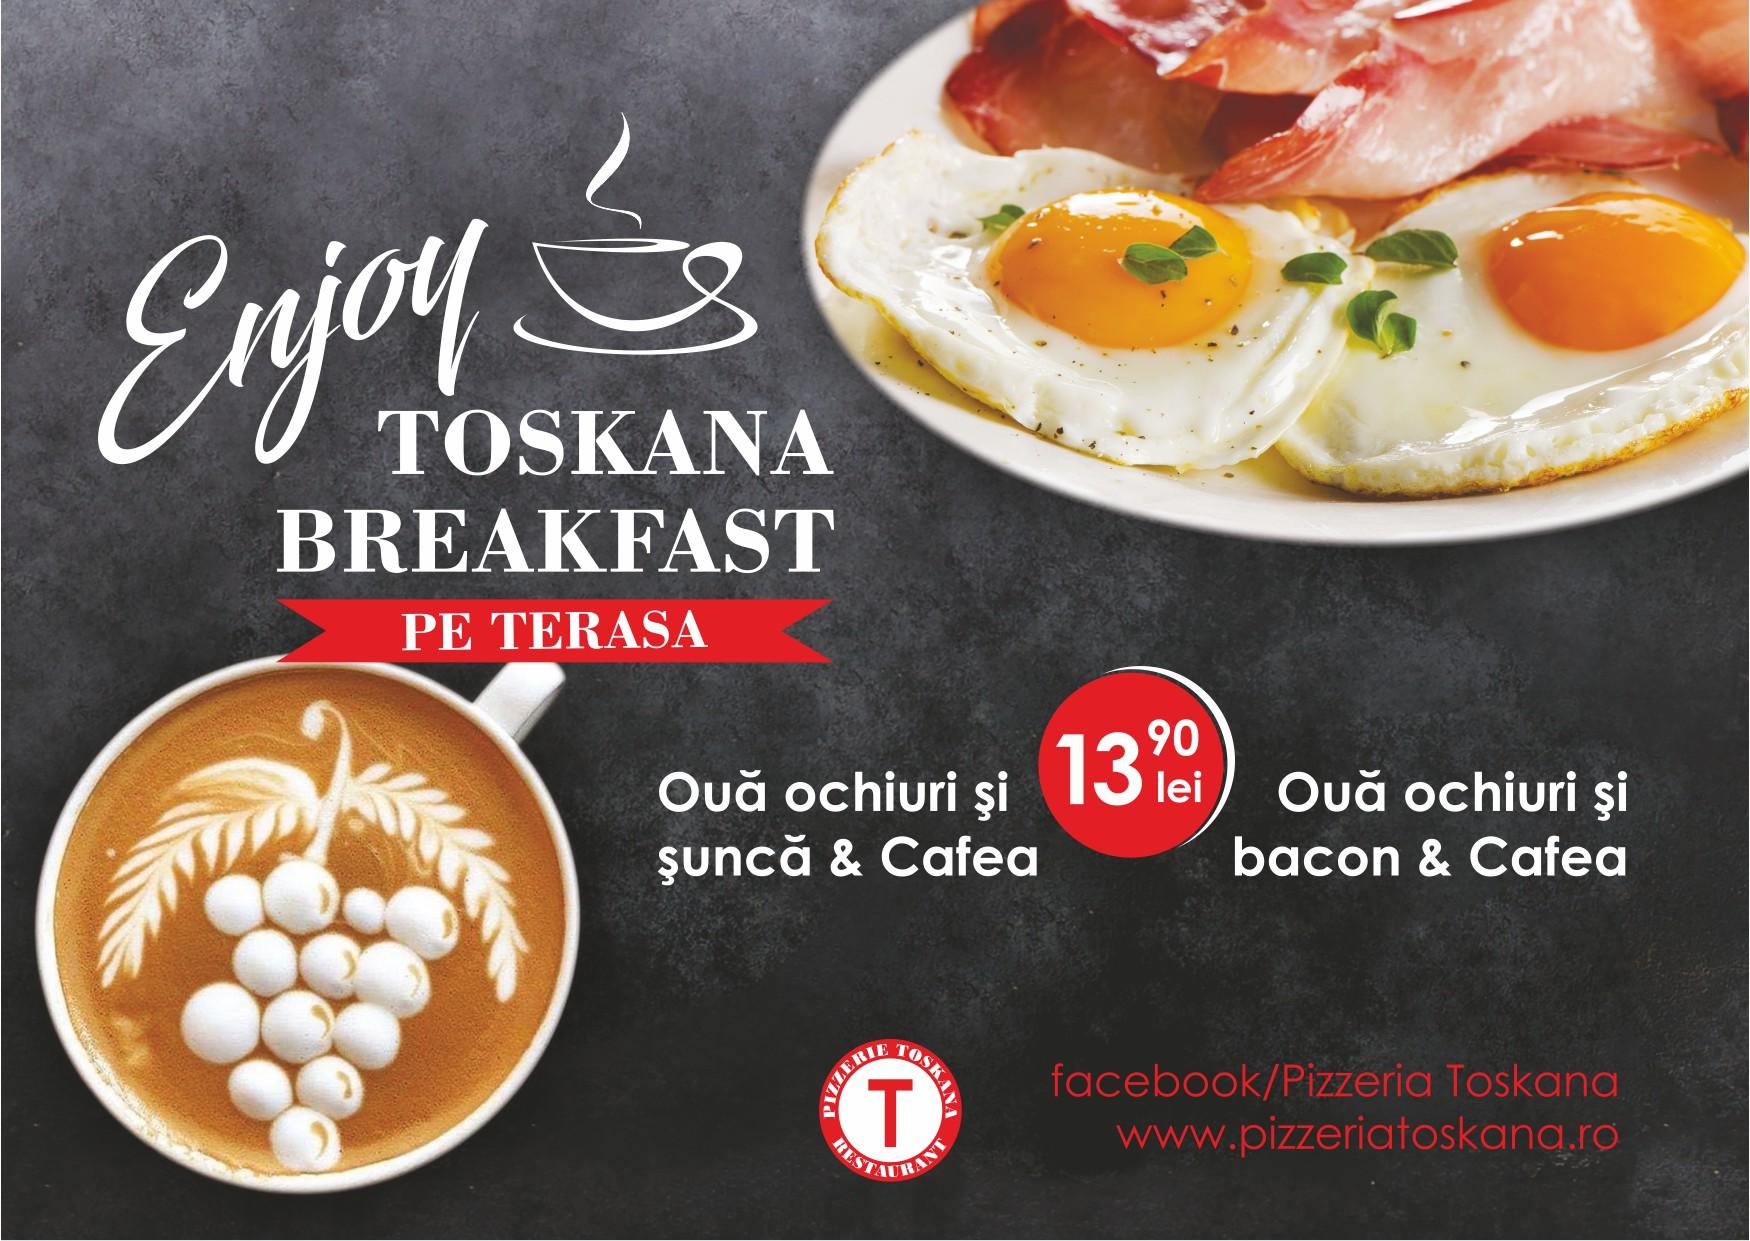 mic dejun cluj toskana